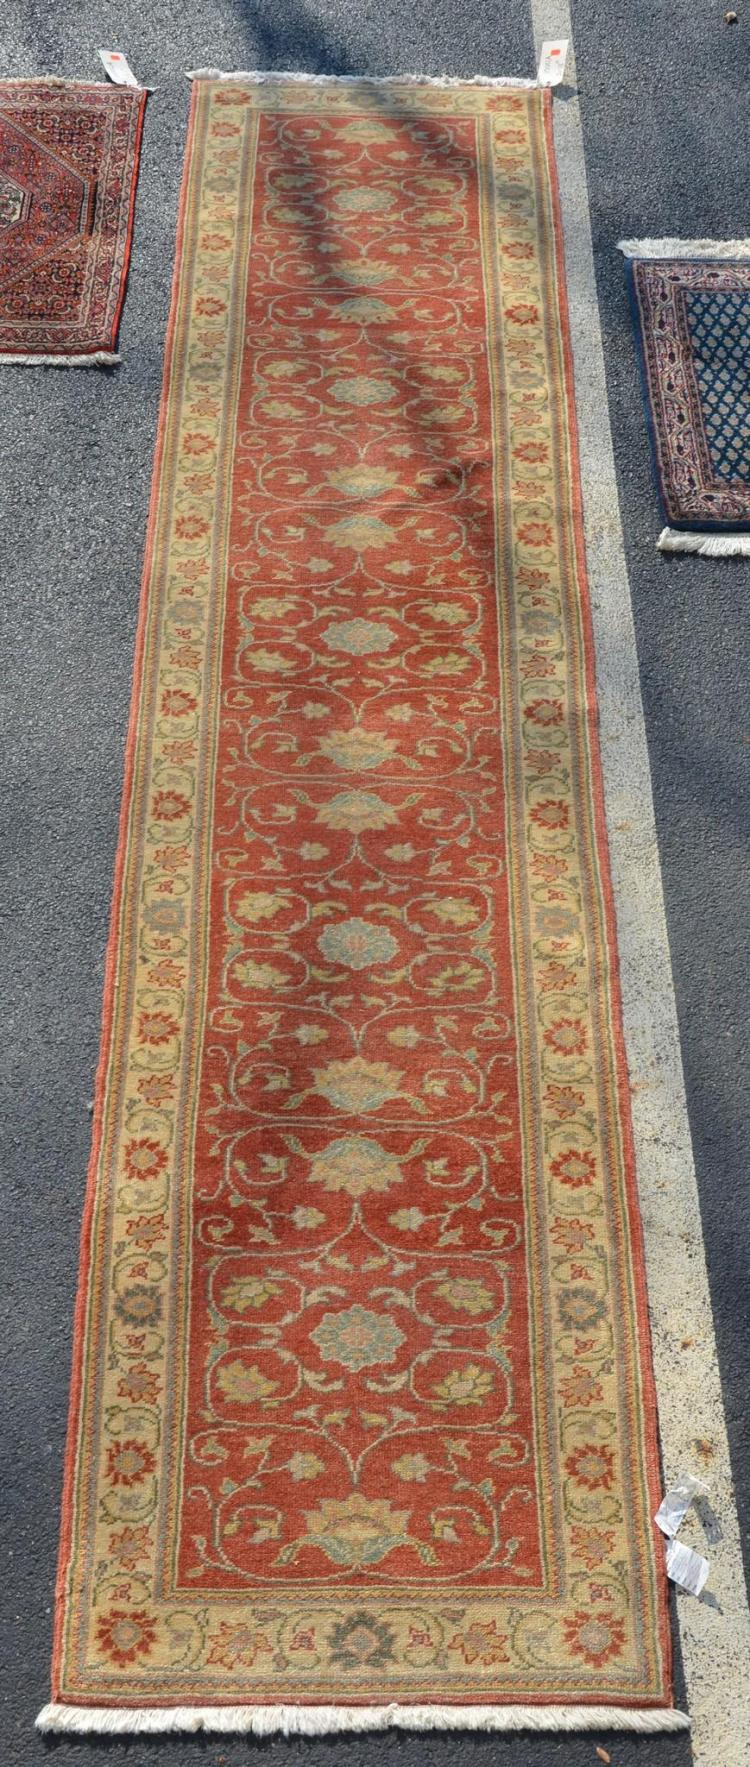 Turkish runner rug, 3'' x 12''10